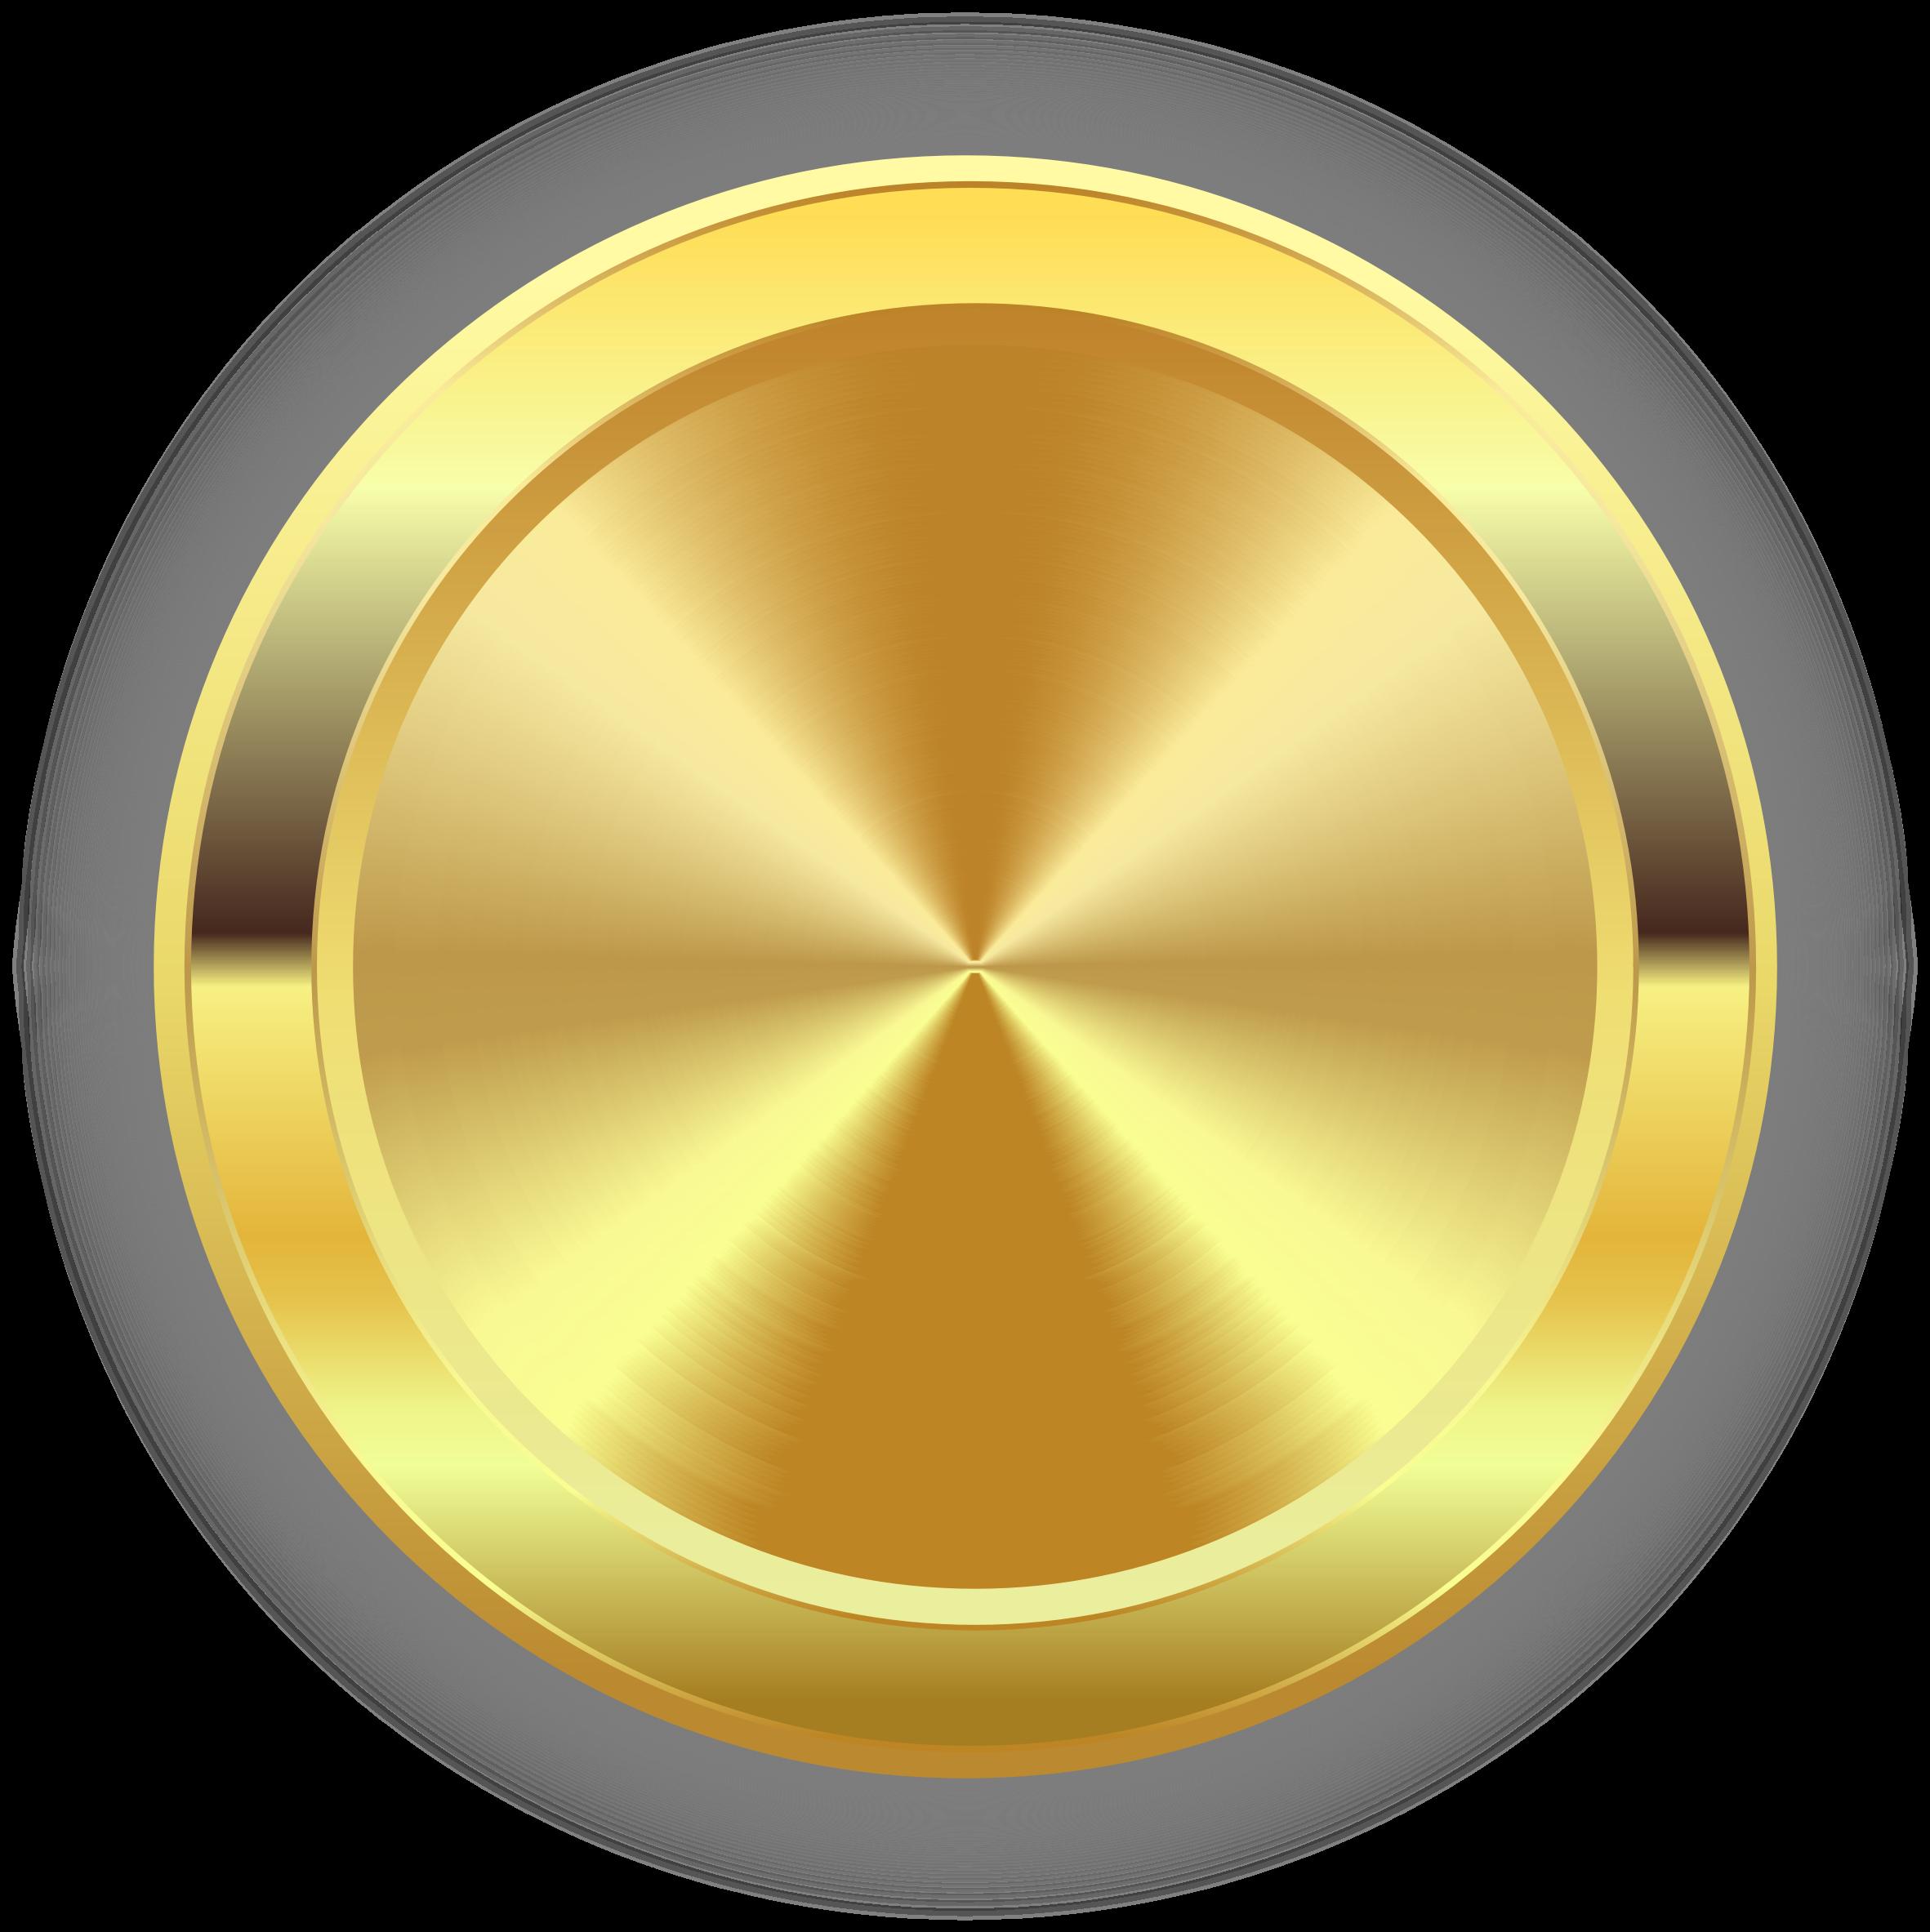 Circle clipart badge. Round golden big image